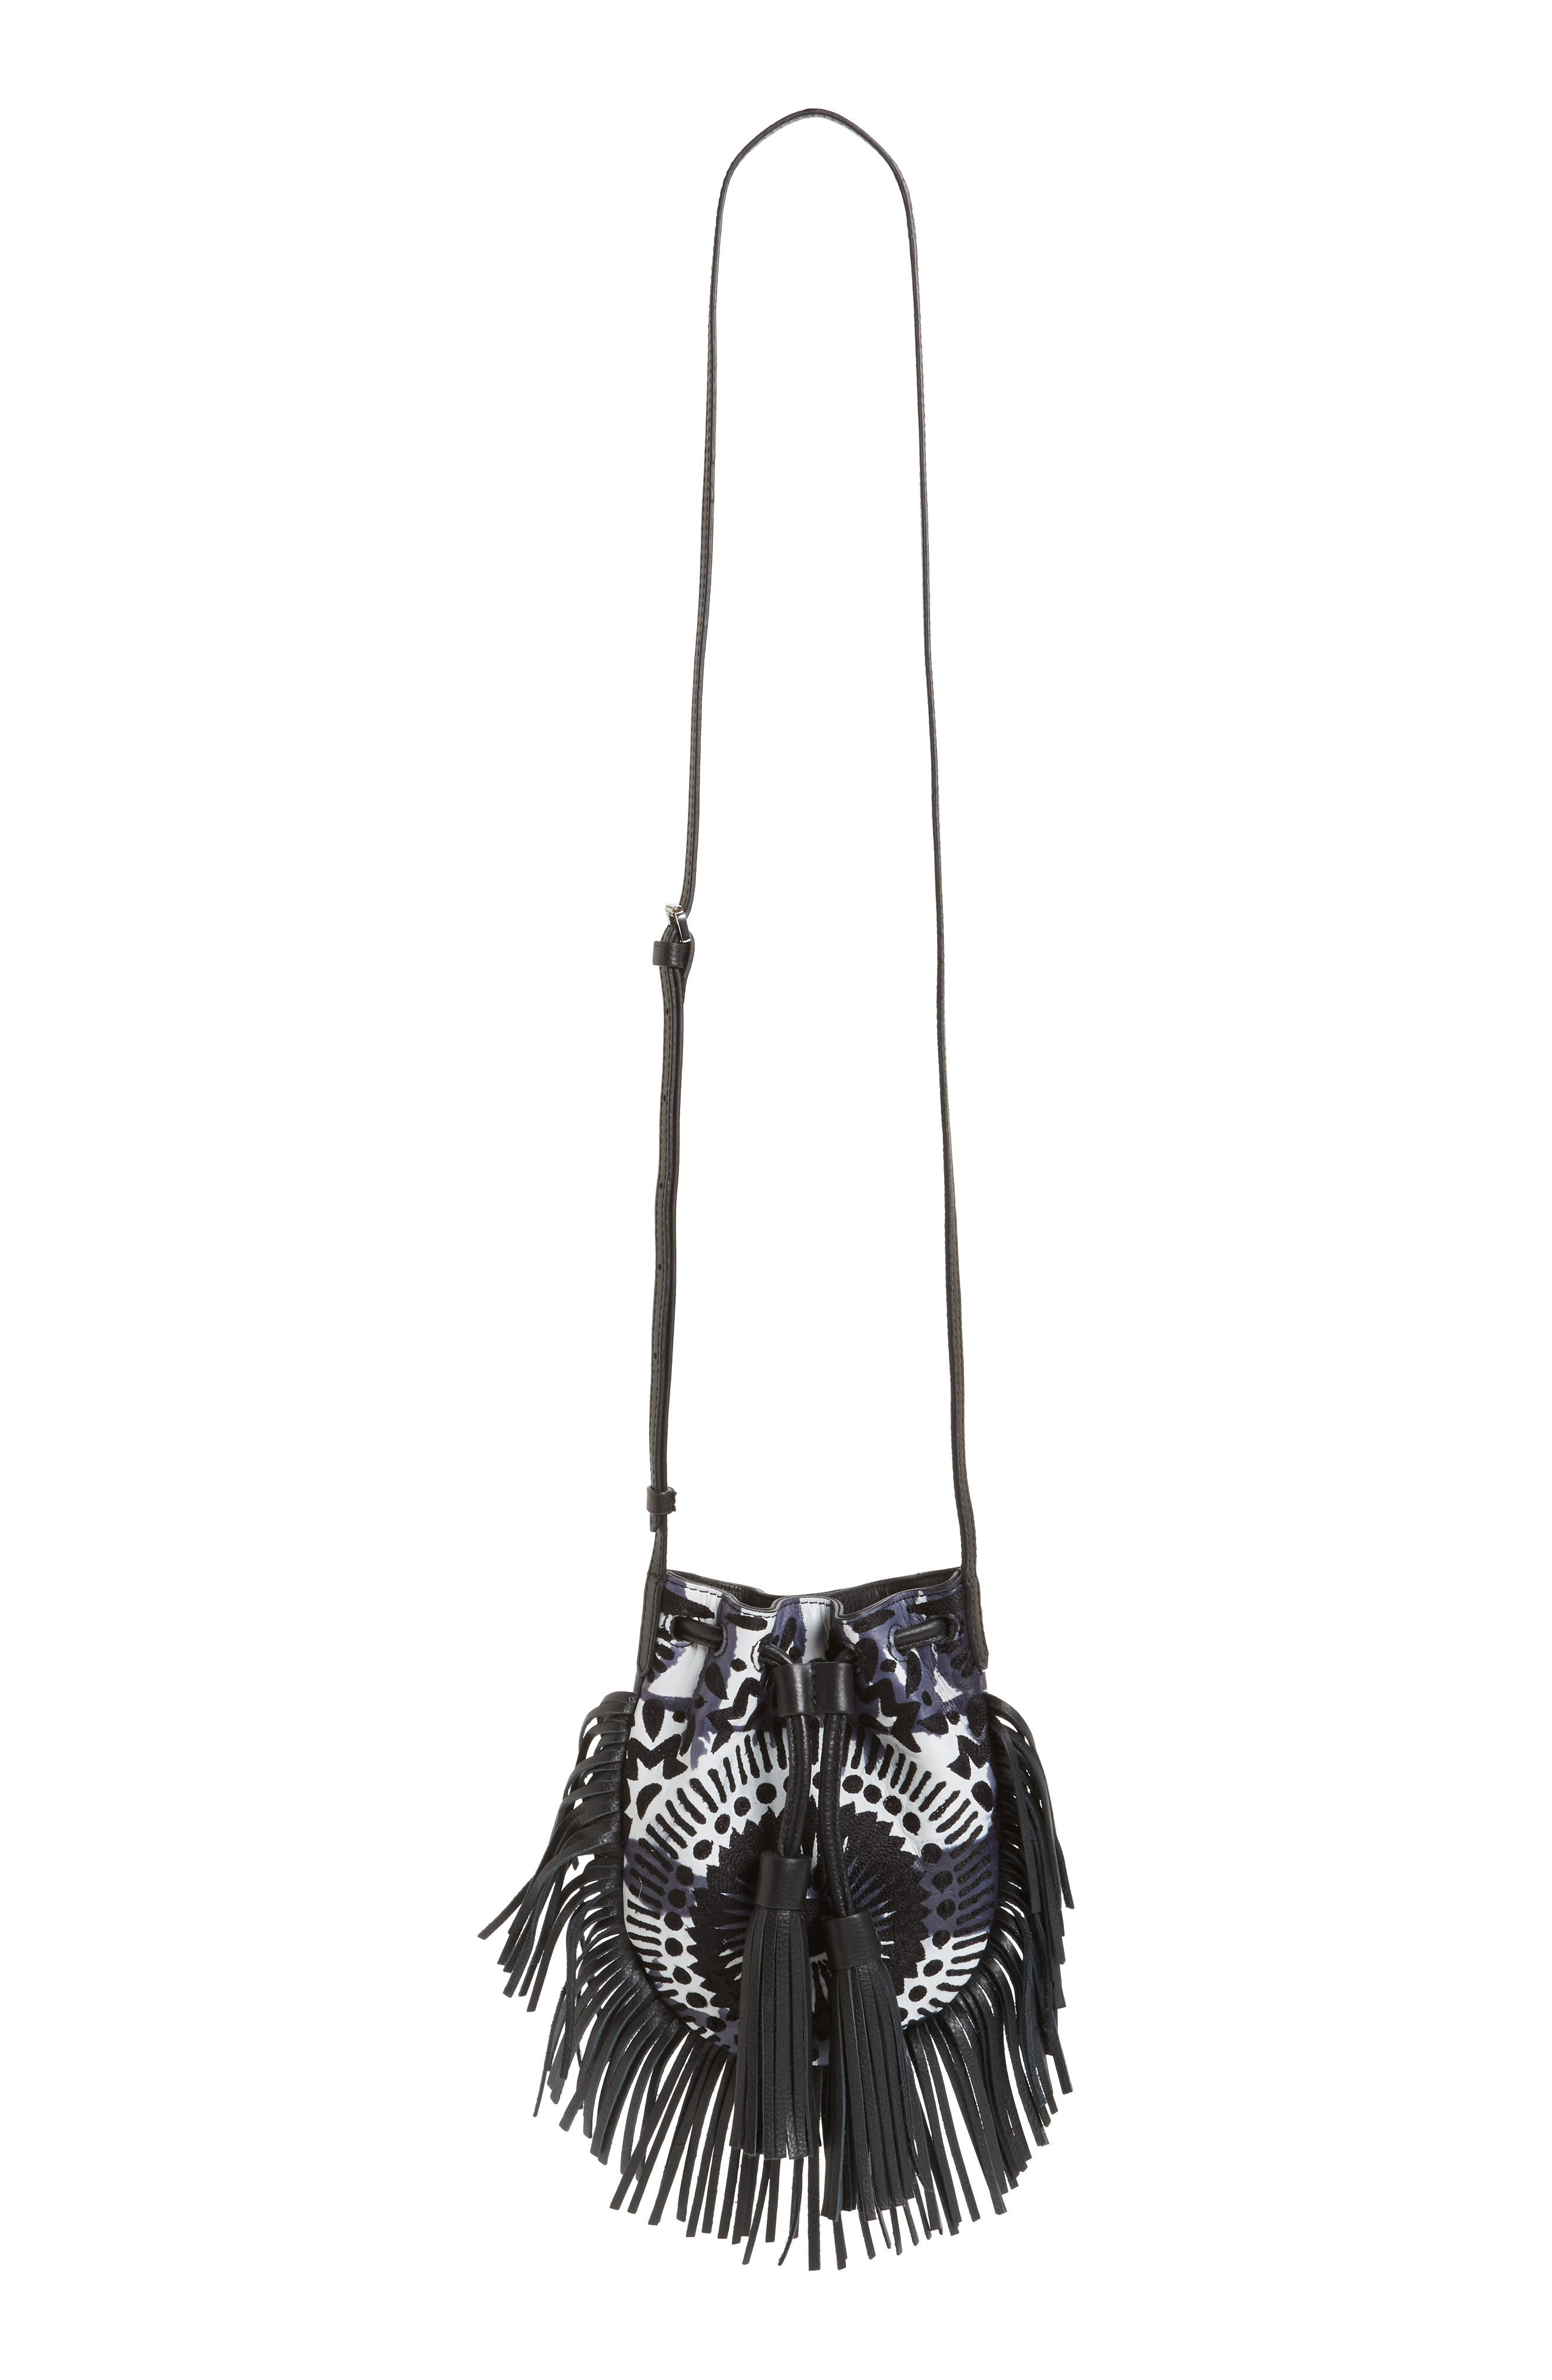 REBECCA MINKOFF, Revel Phone Crossbody Bag, Main thumbnail 1, color, 001